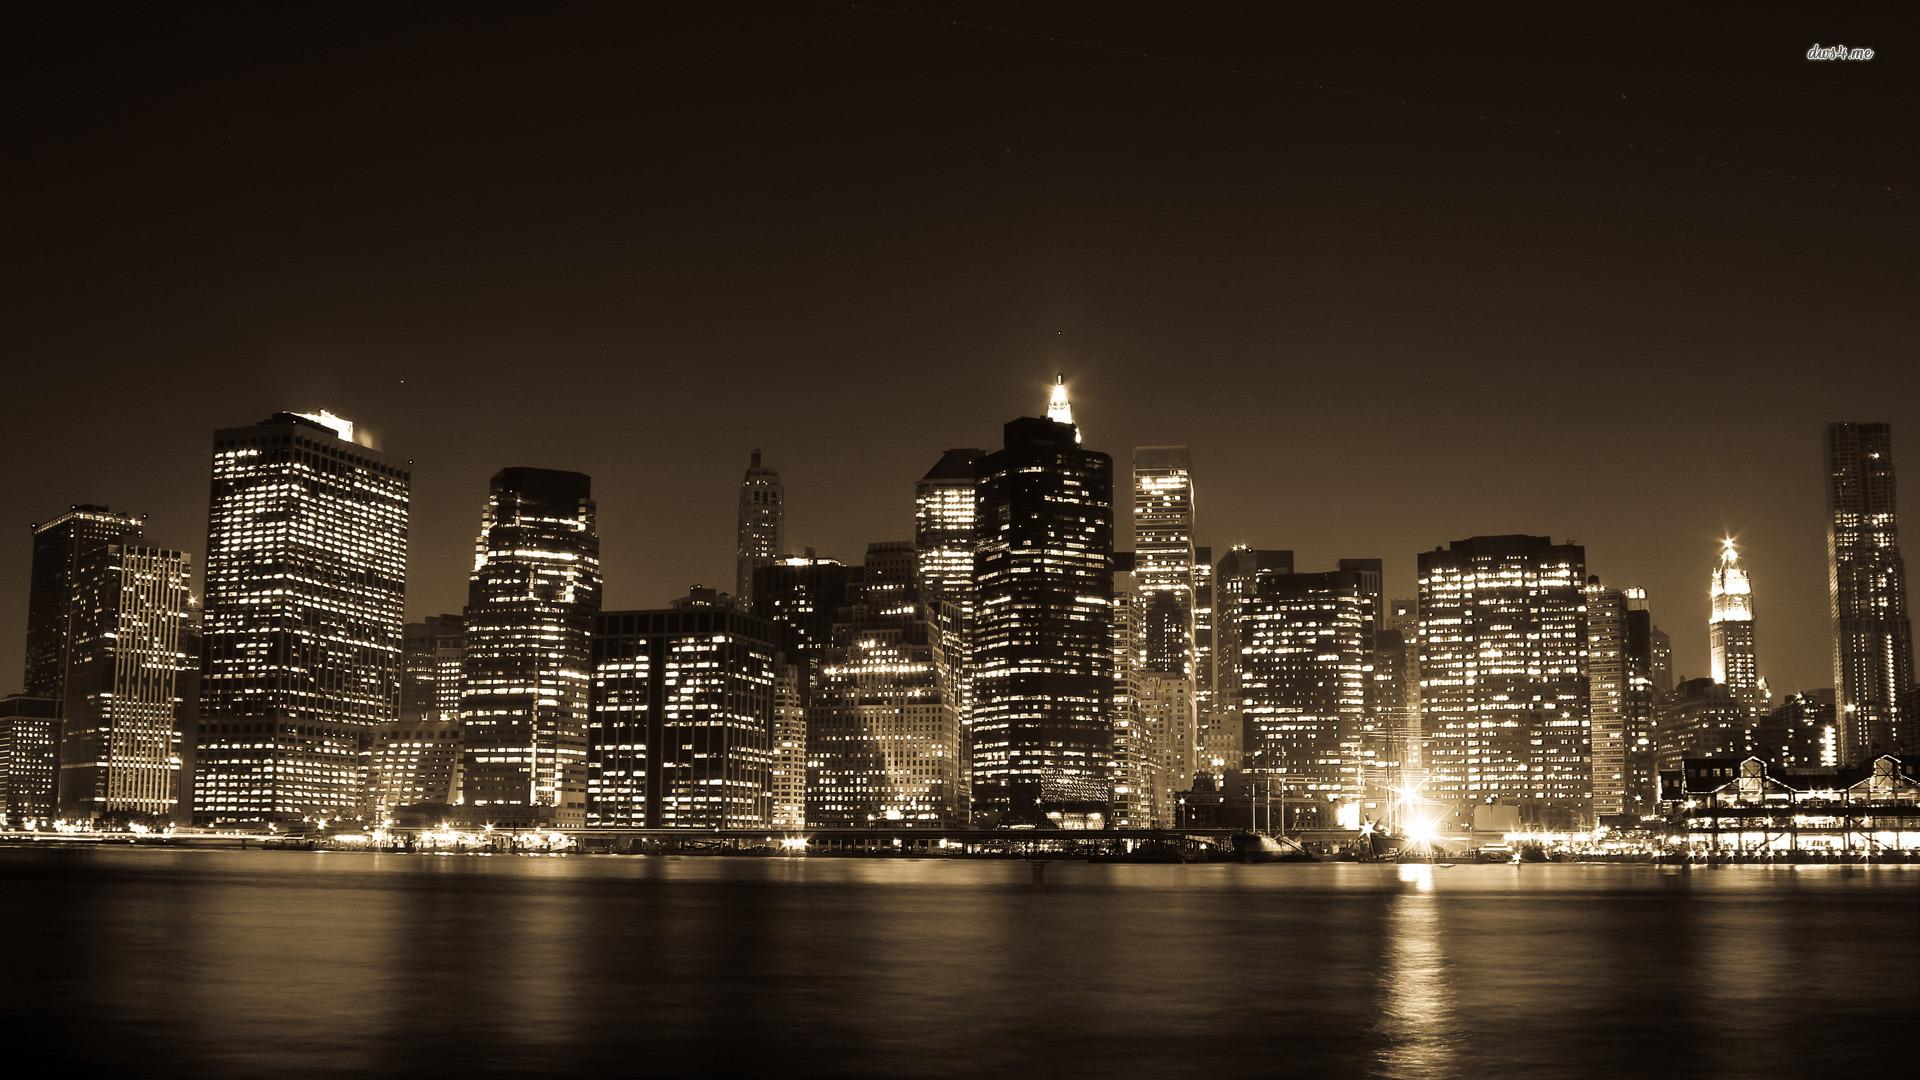 New York City Lights wallpaper 1920x1080